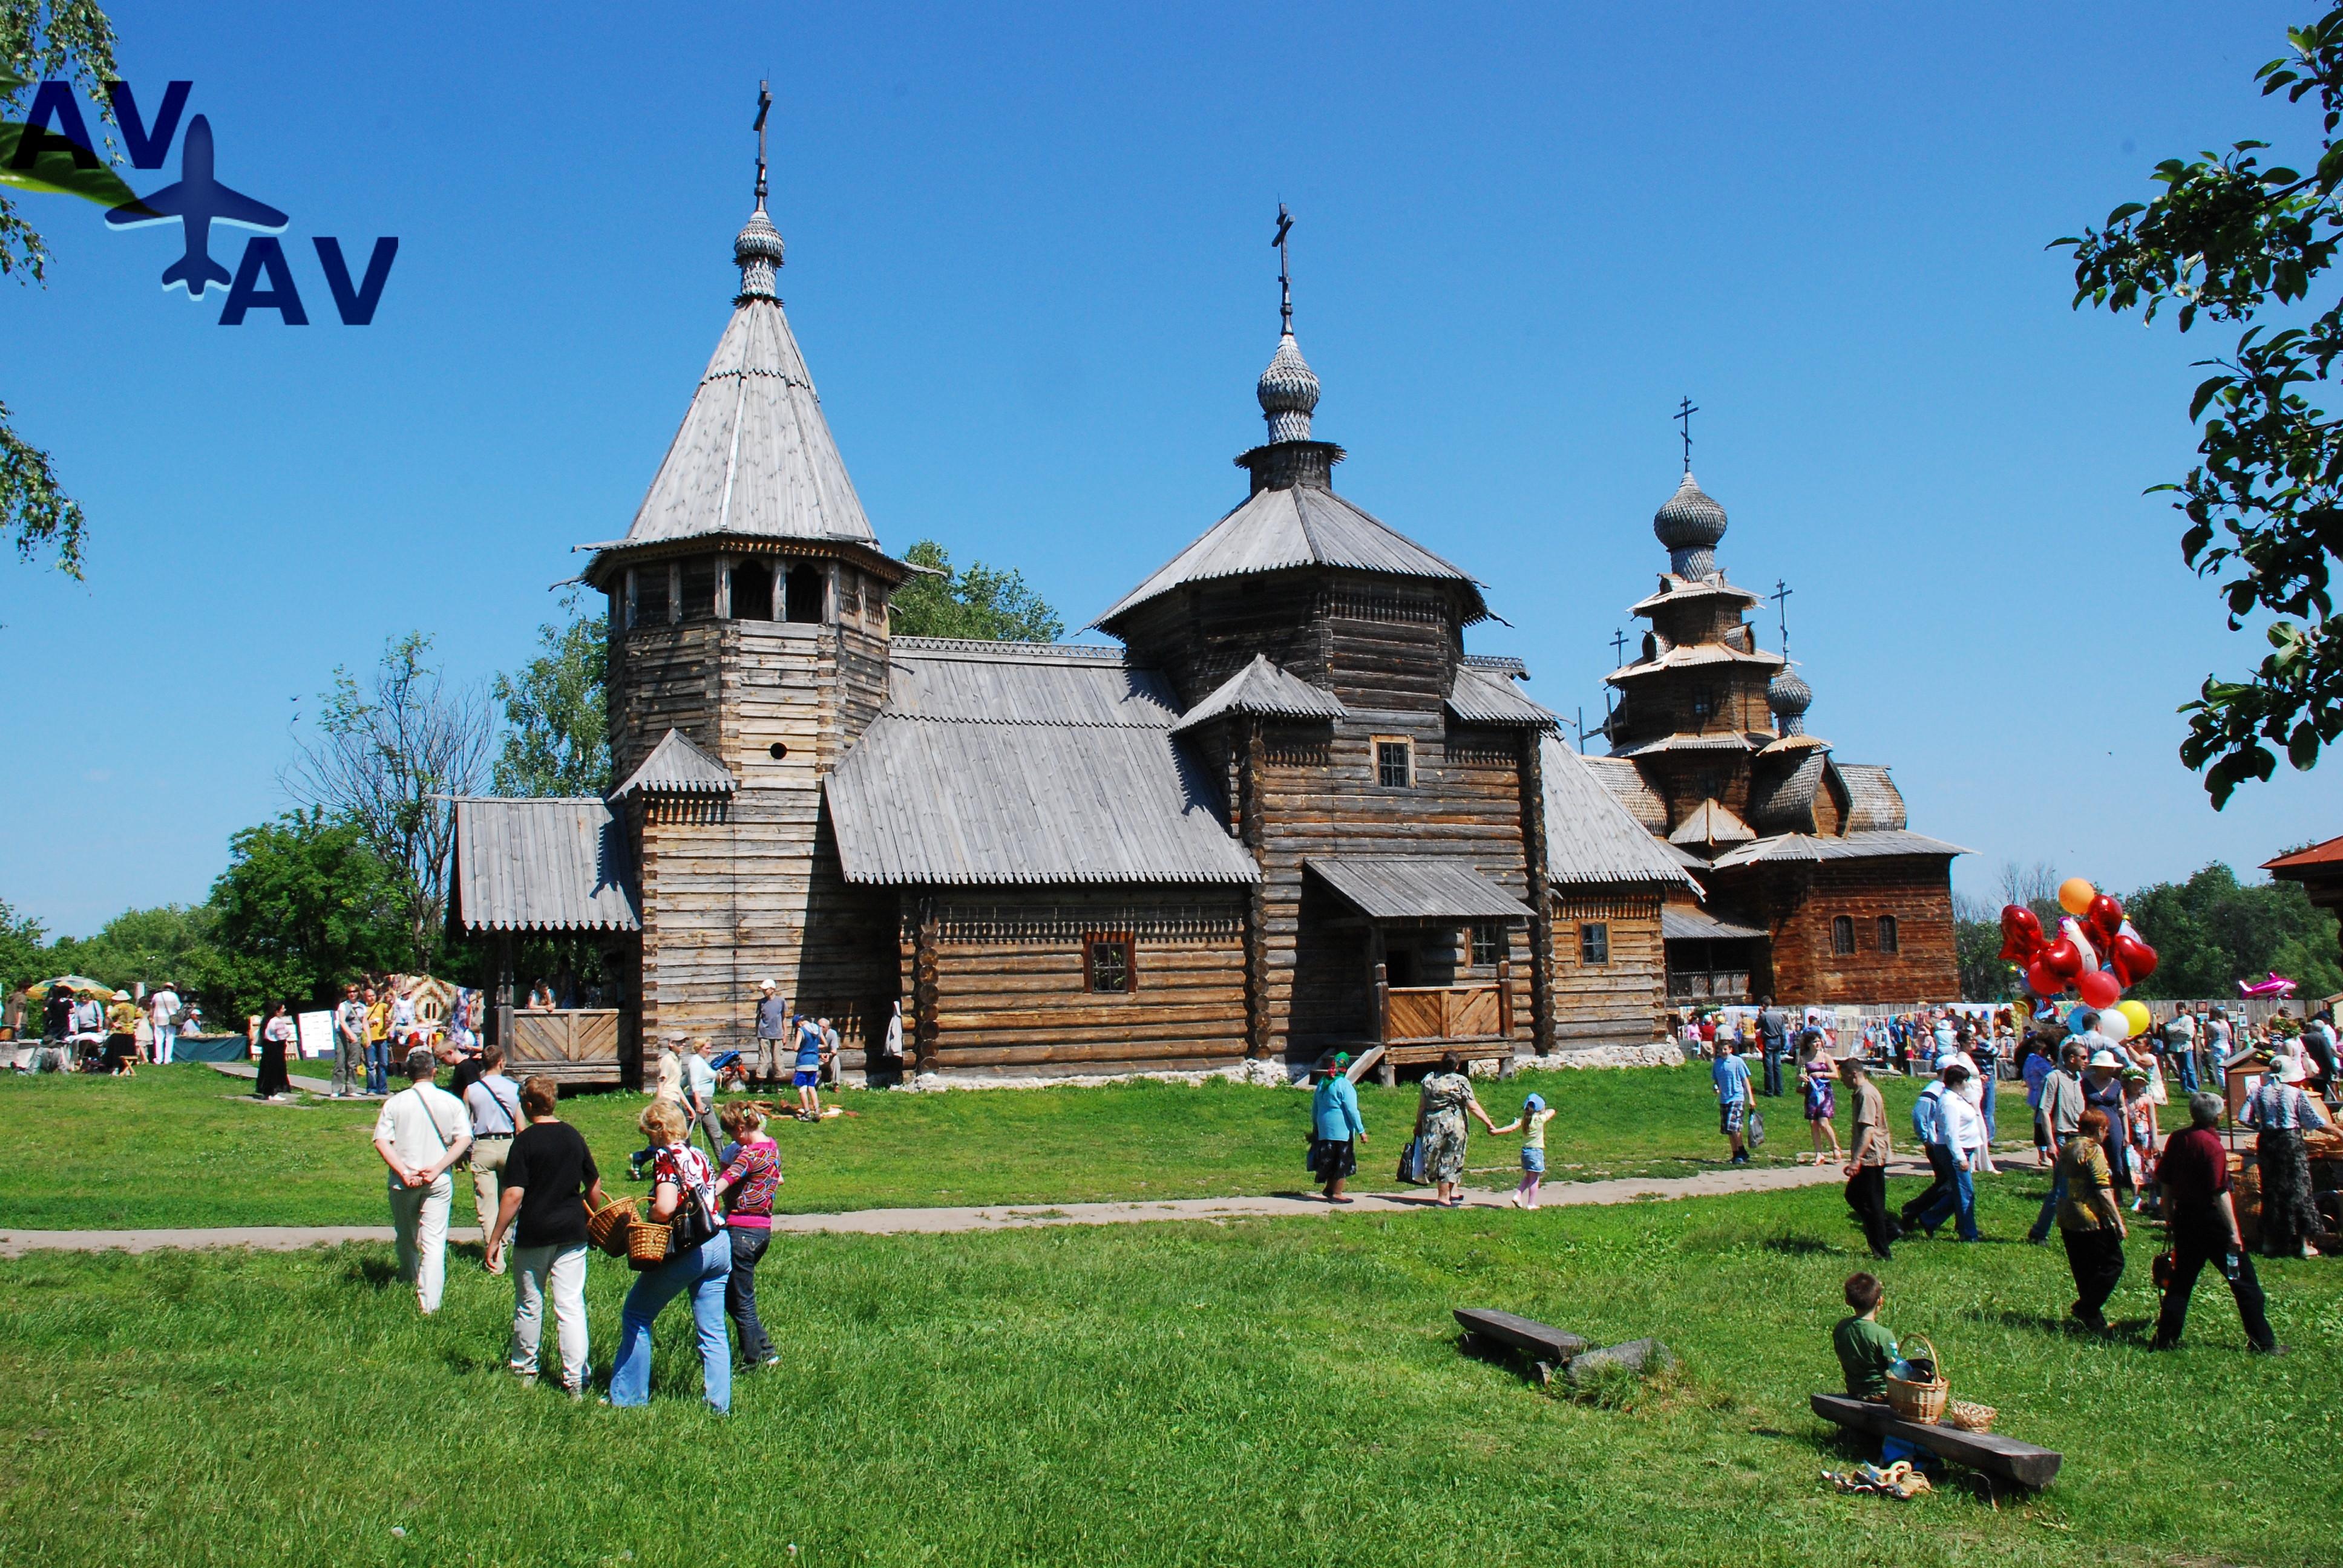 Zolotoe koltso Rossii - Золотое кольцо России